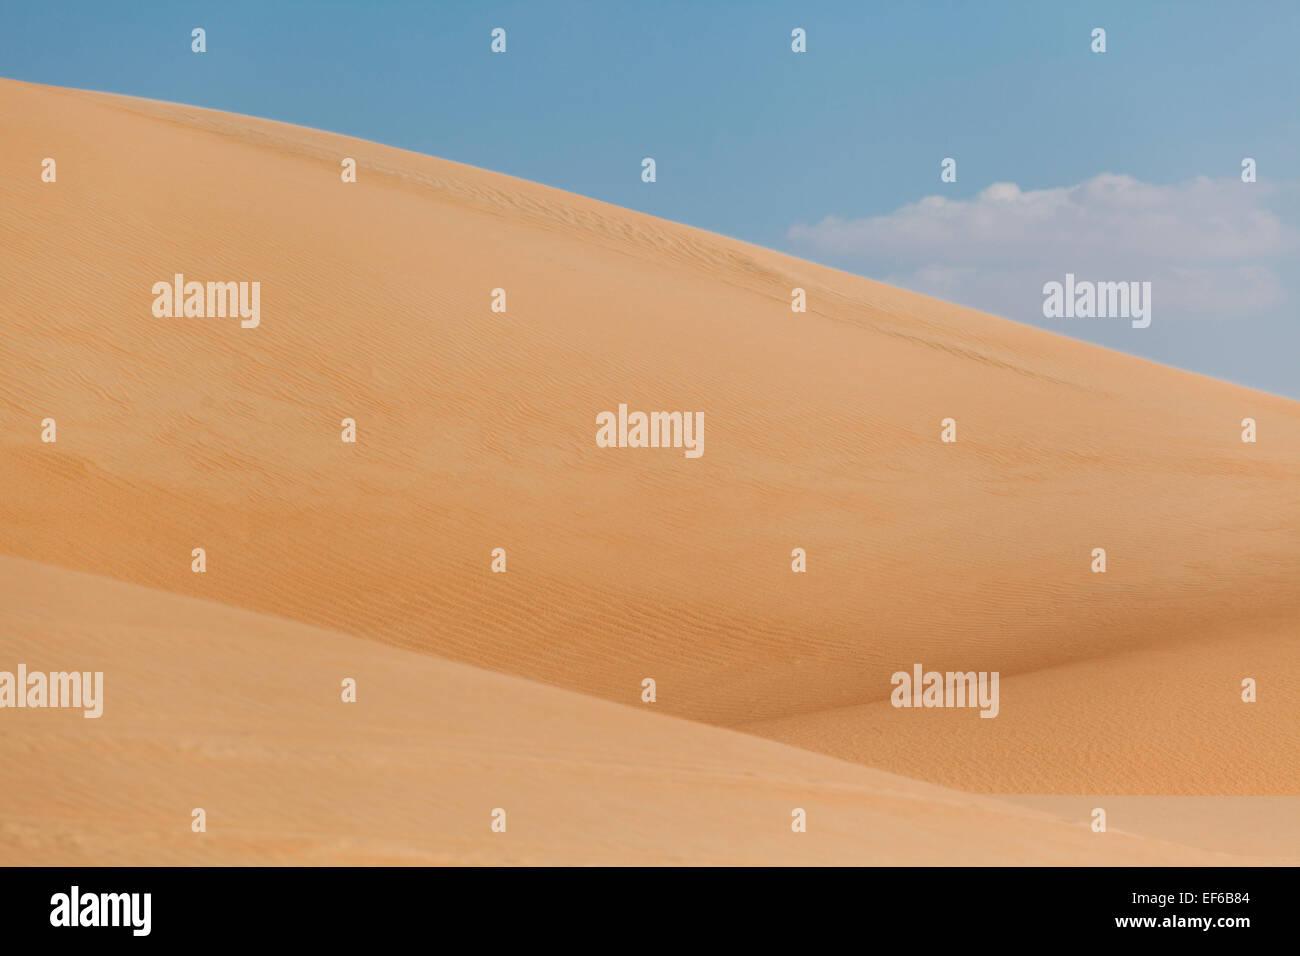 Giant sand dunes of oman desert arabian peninsula stock photo giant sand dunes of oman desert arabian peninsula sciox Images